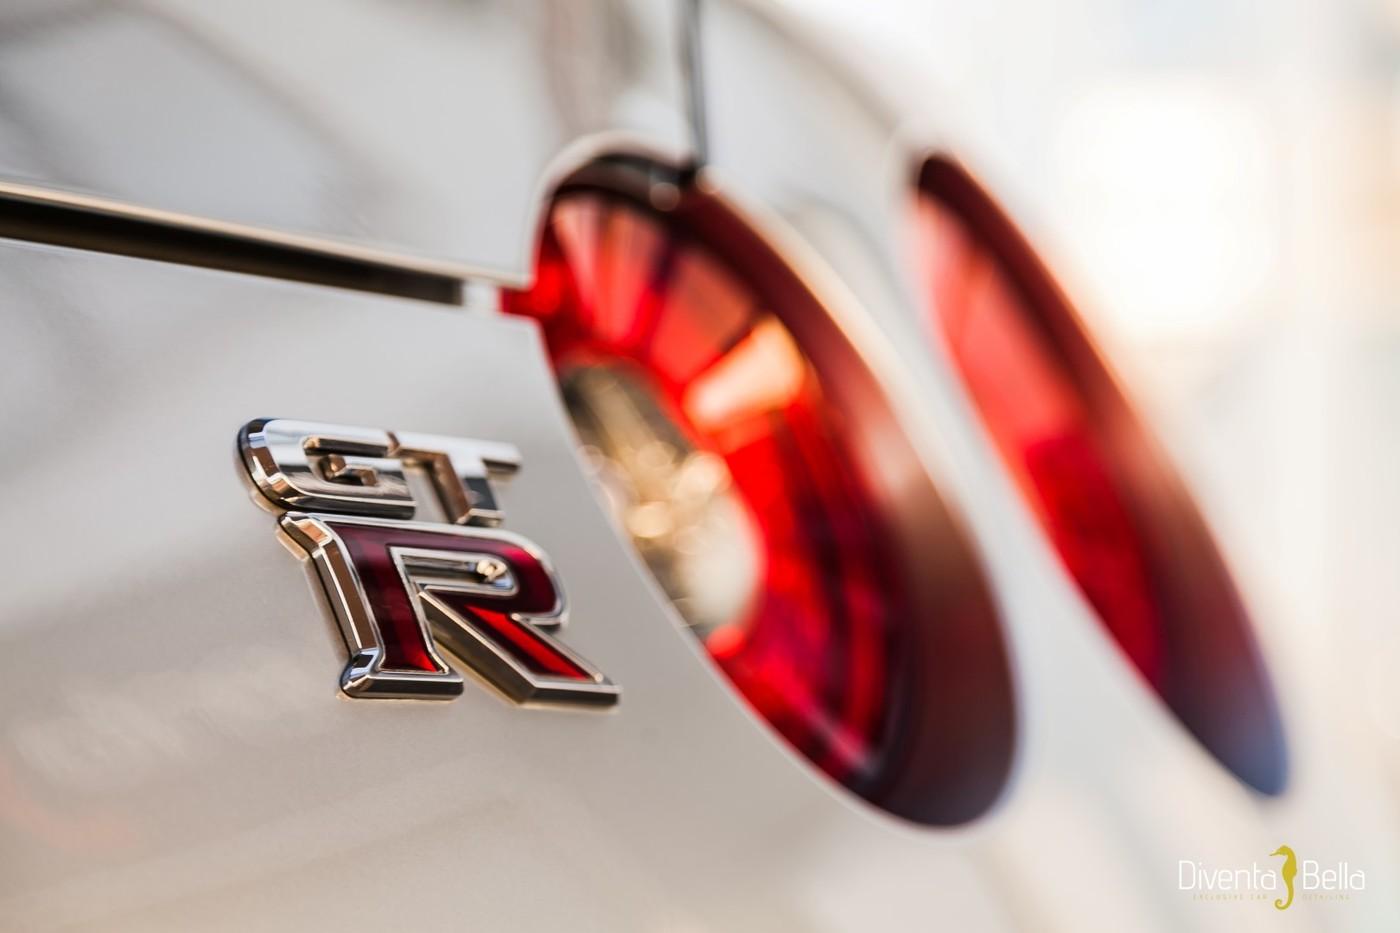 Nissan_GTR%20(6).JPG